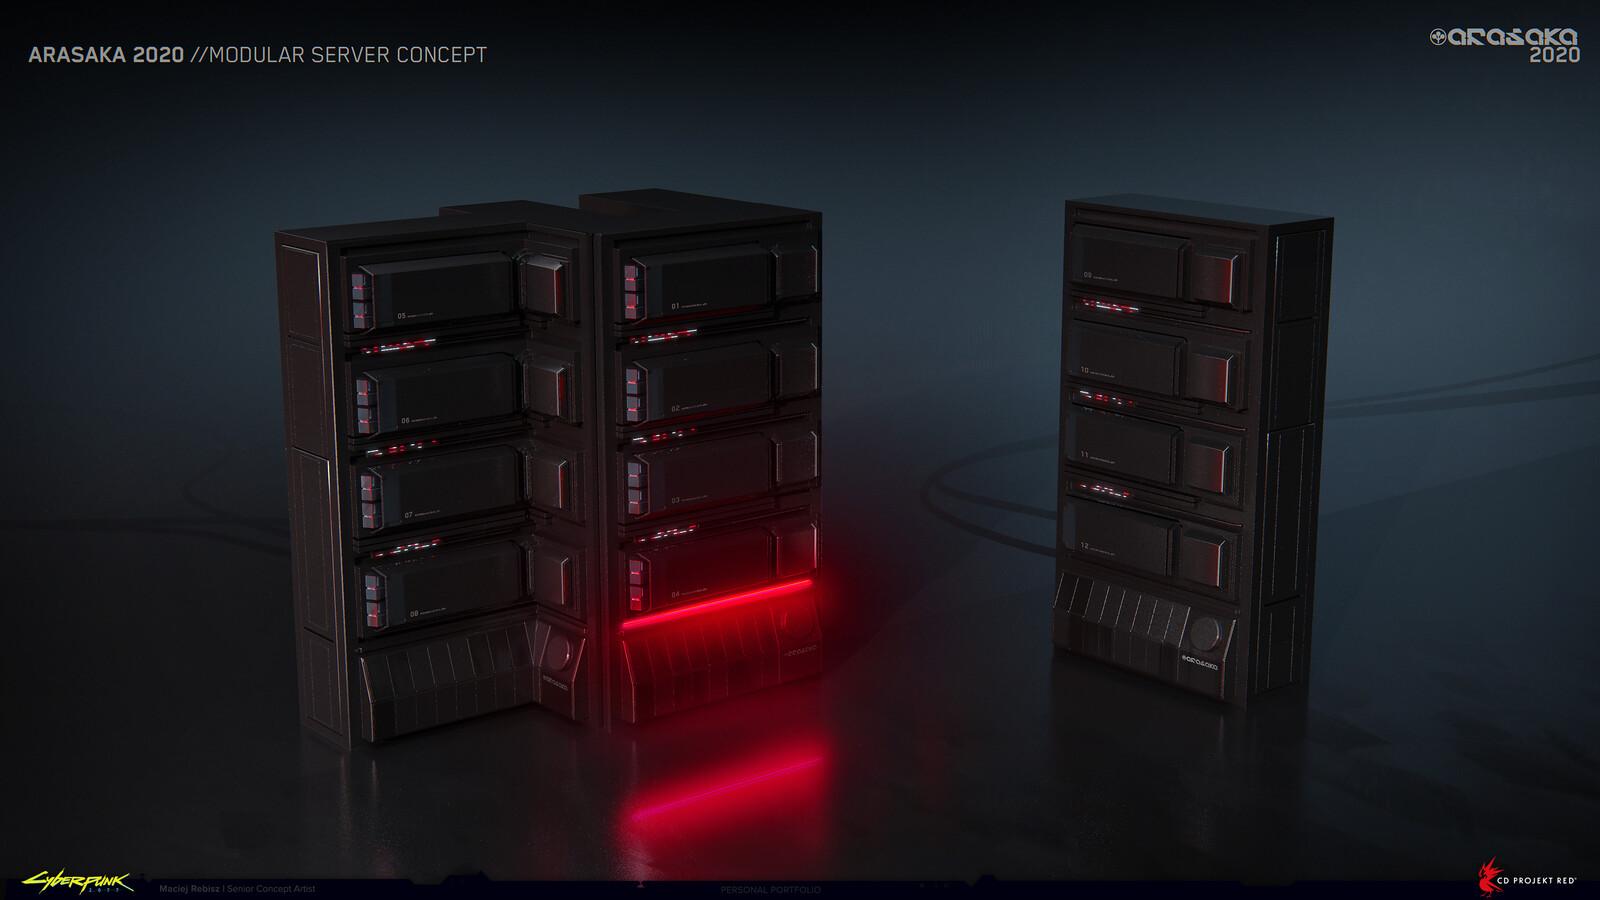 Arasaka servers